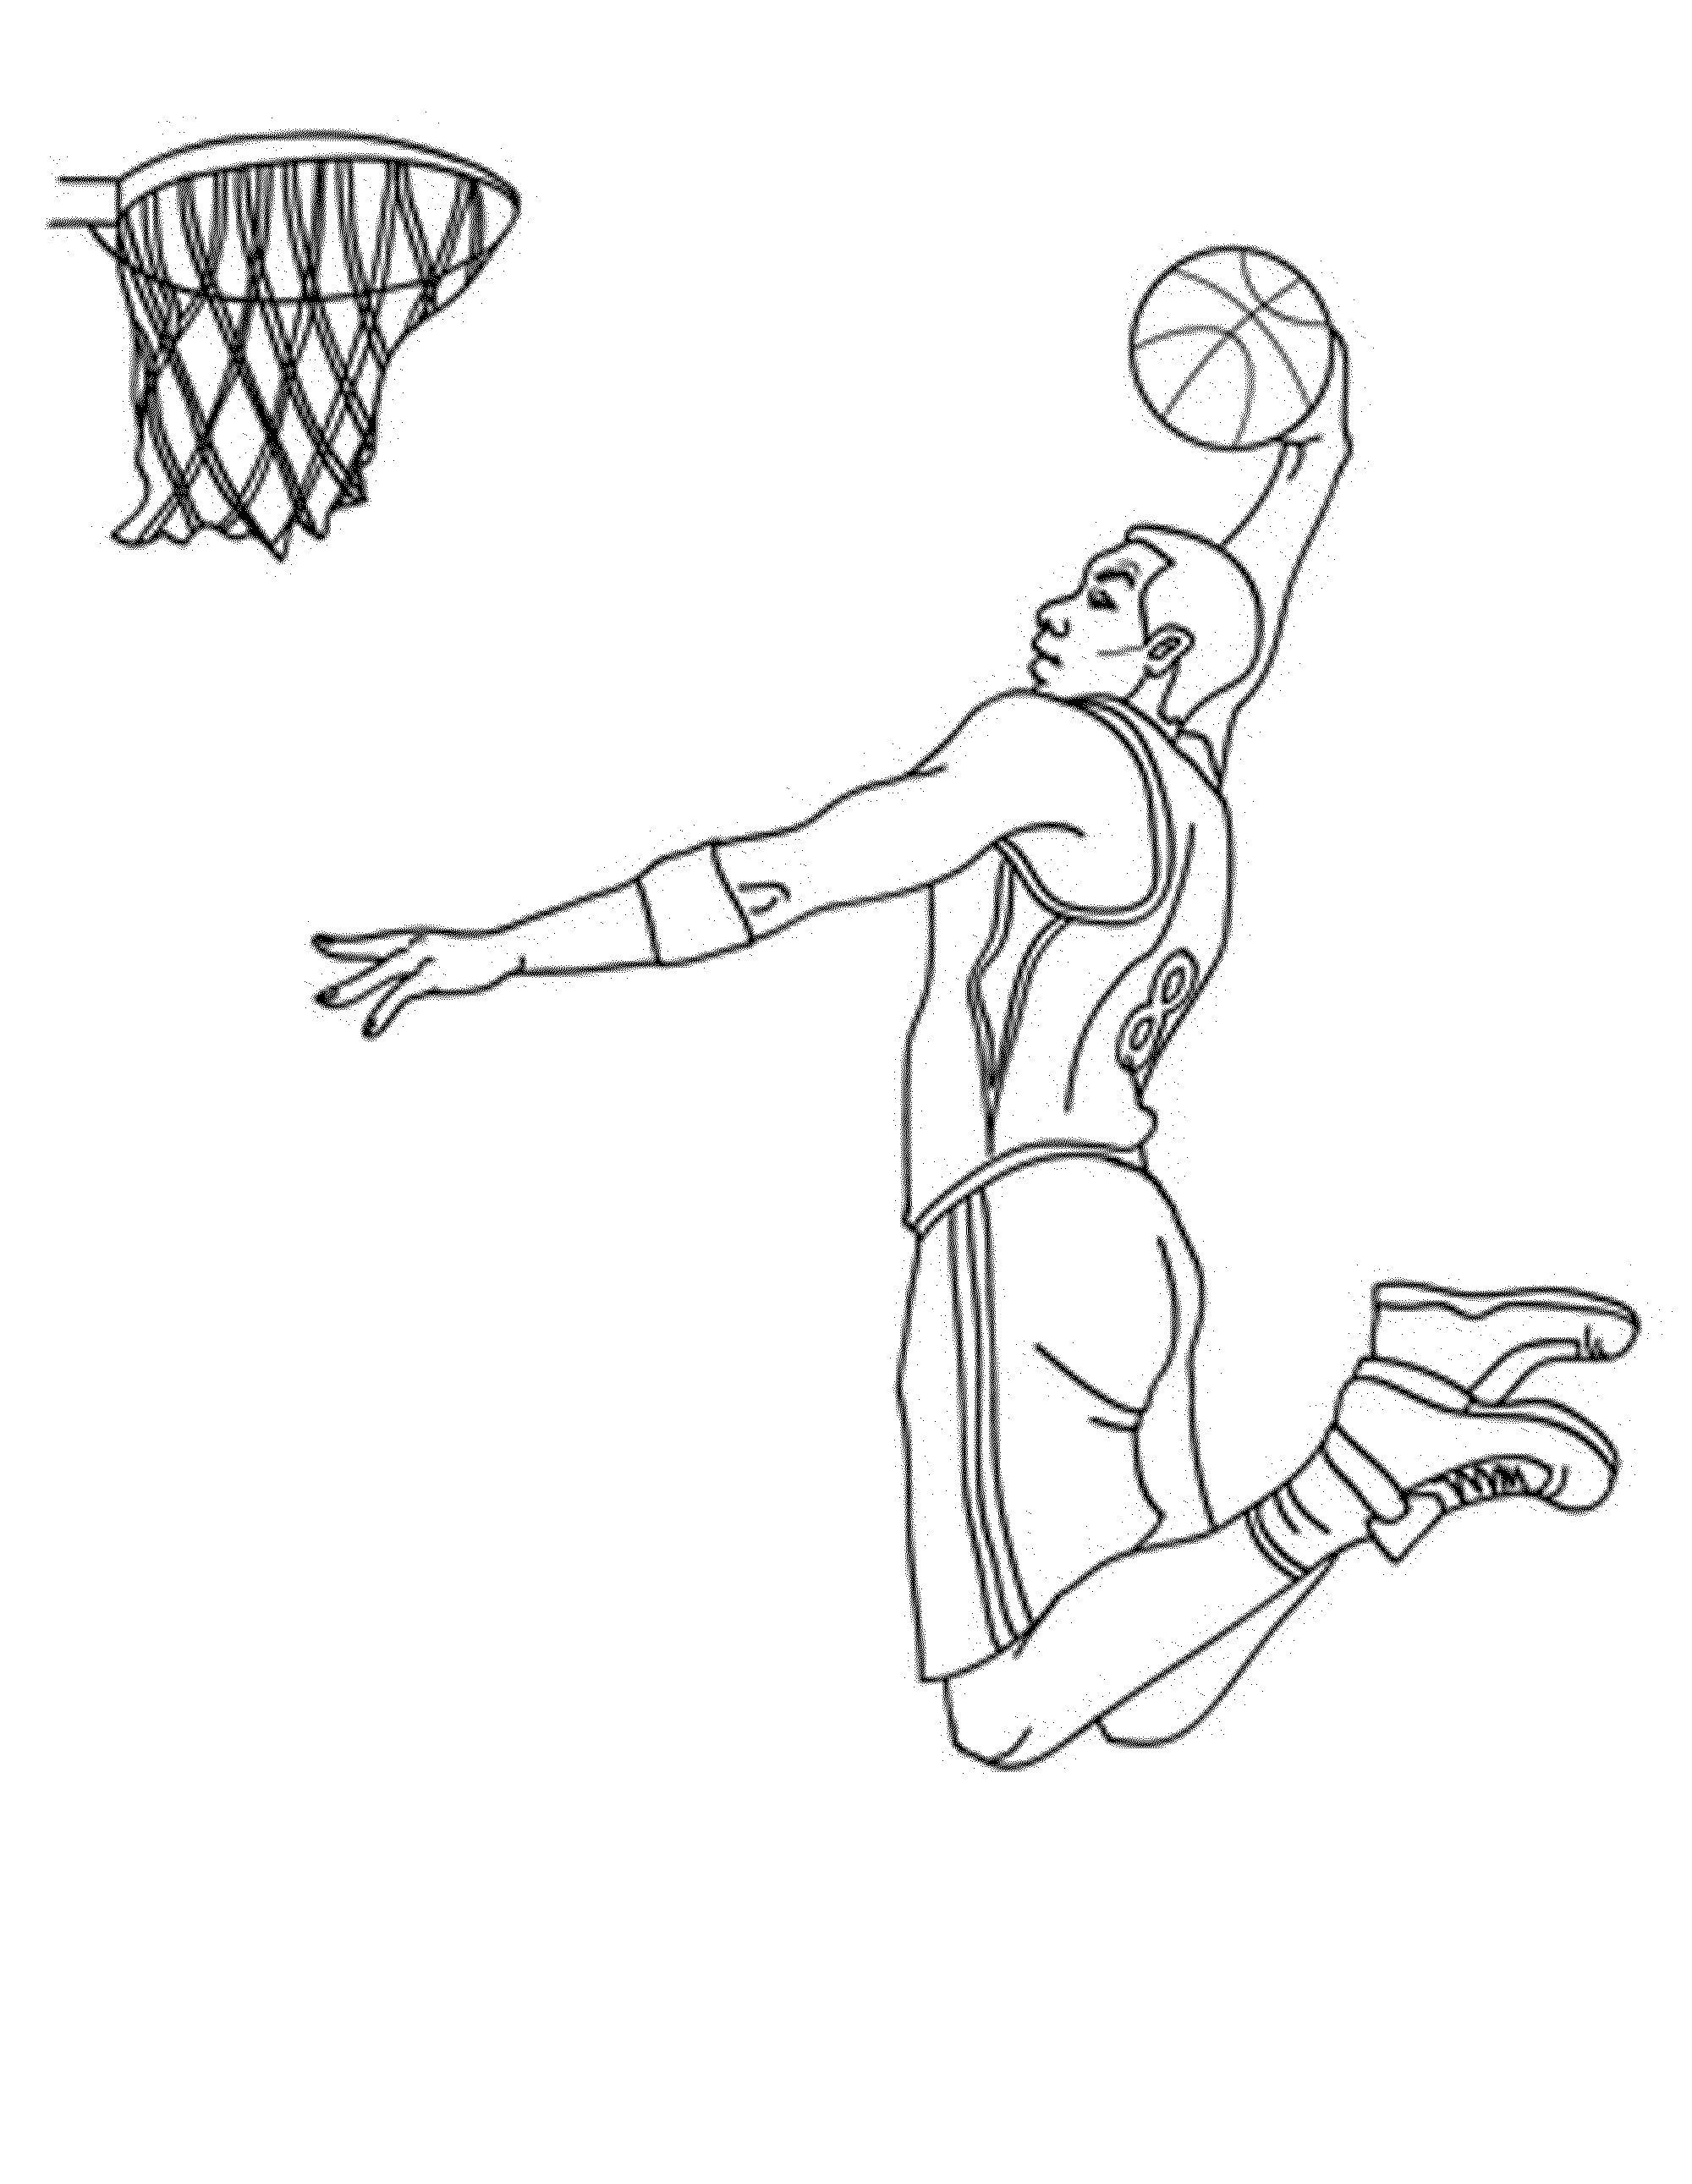 Lebron James Coloring Pages Nba Coloring Pages Of Lebron James Fresh Printable Best Bltidm Leri Entitlementtrap Com Sports Drawings Free Basketball Lebron James